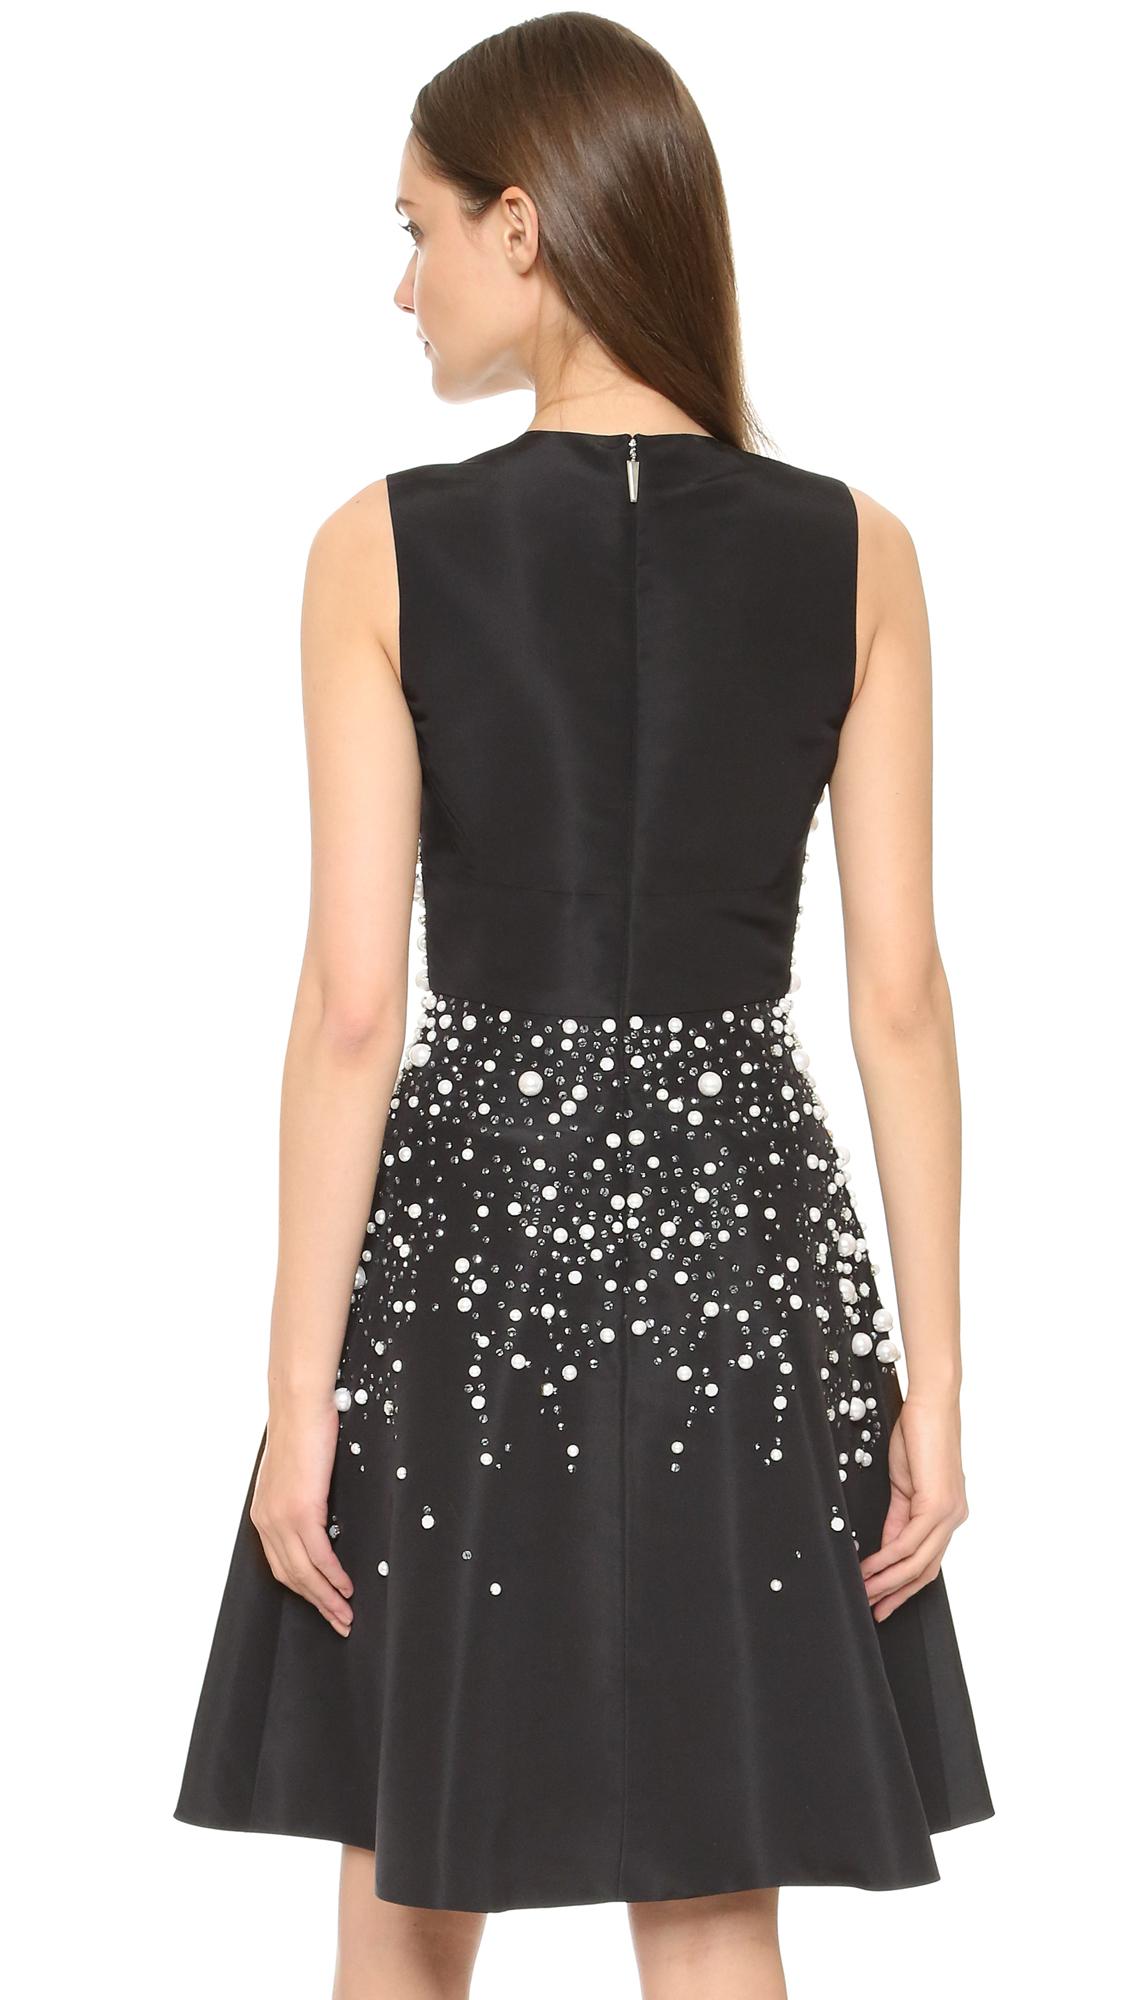 Prabal gurung Sleeveless Dress in Black